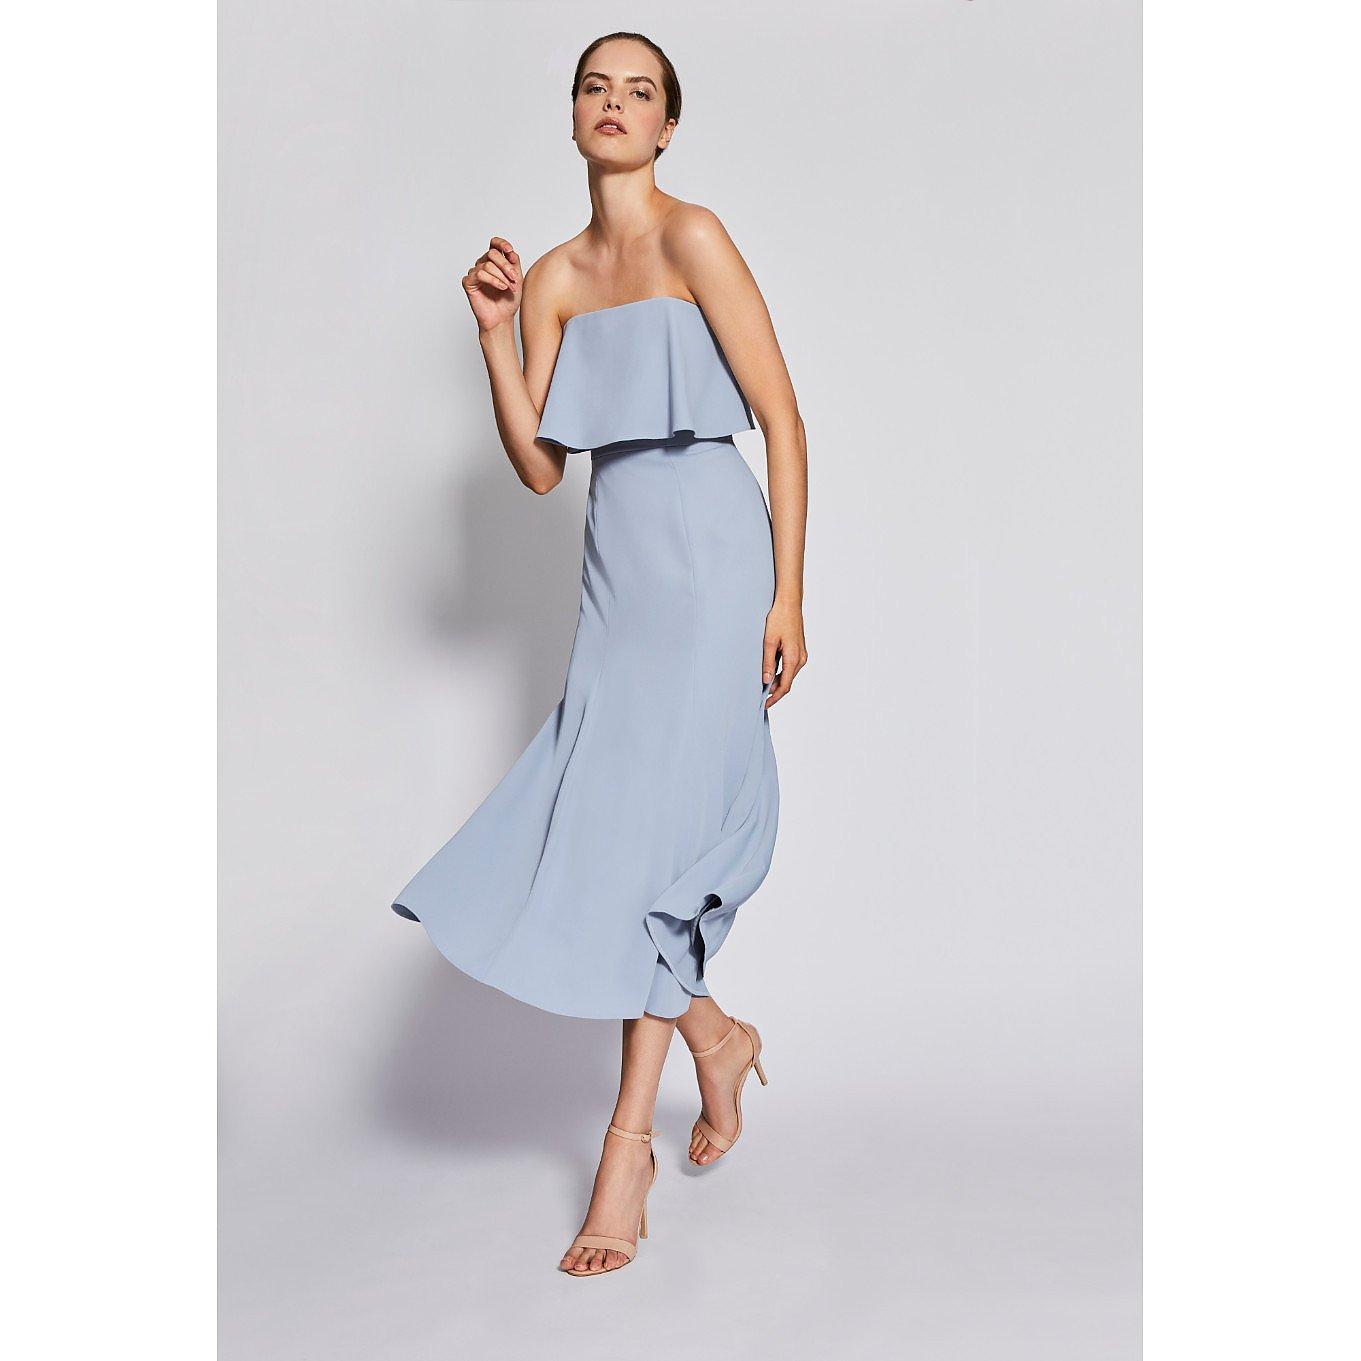 Charlie Brear Maia Dress